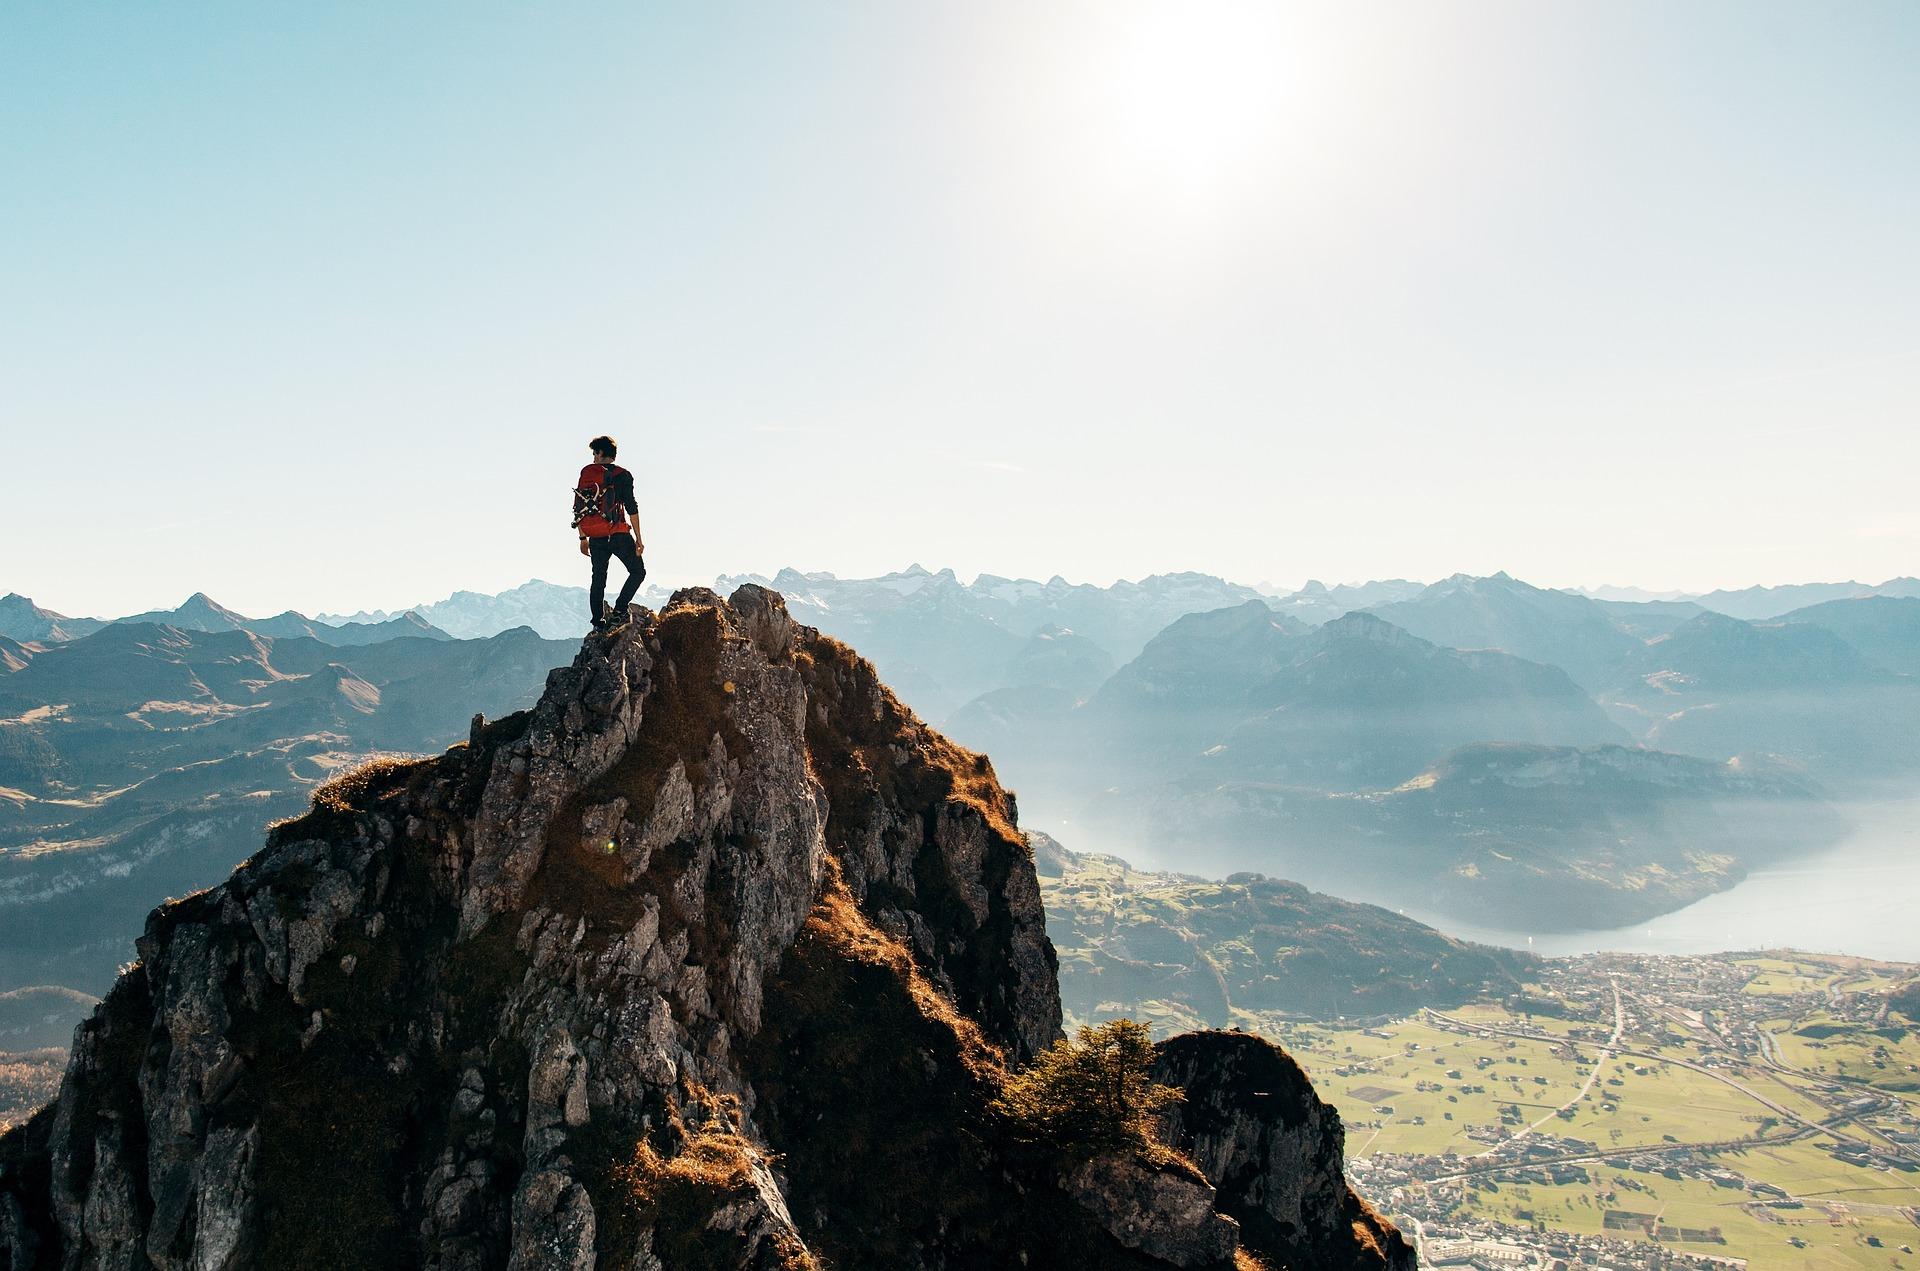 hiking-2618010_1920